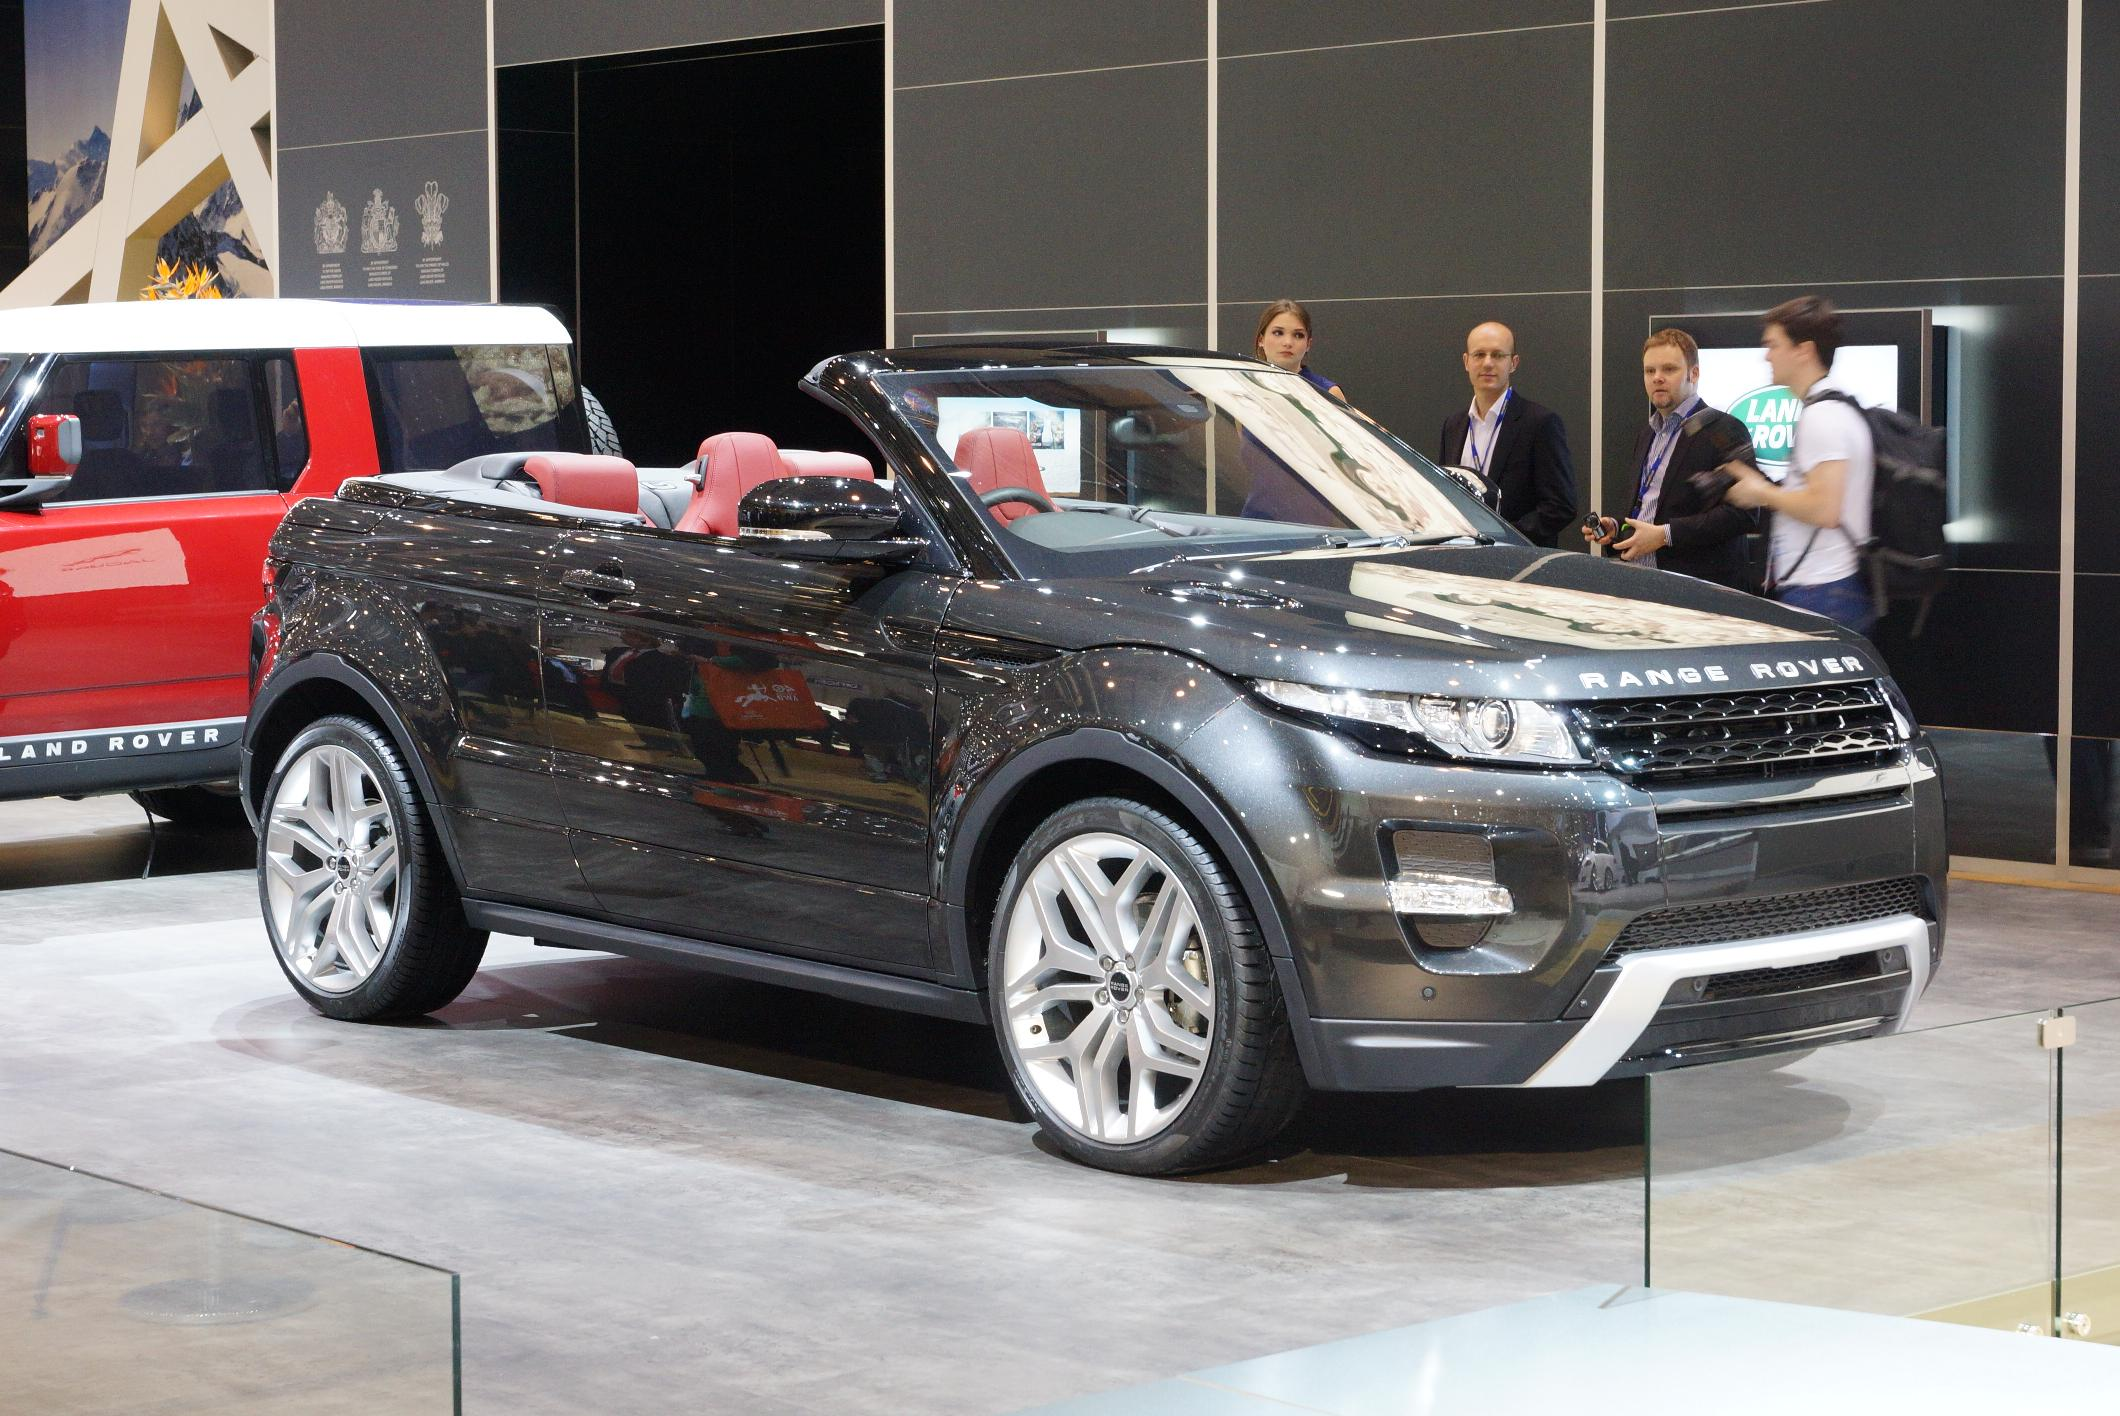 https://upload.wikimedia.org/wikipedia/commons/4/47/2012_Geneva_Motor_Show_-_Range_Rover_Evoque_Convertible_%286974963889%29.jpg